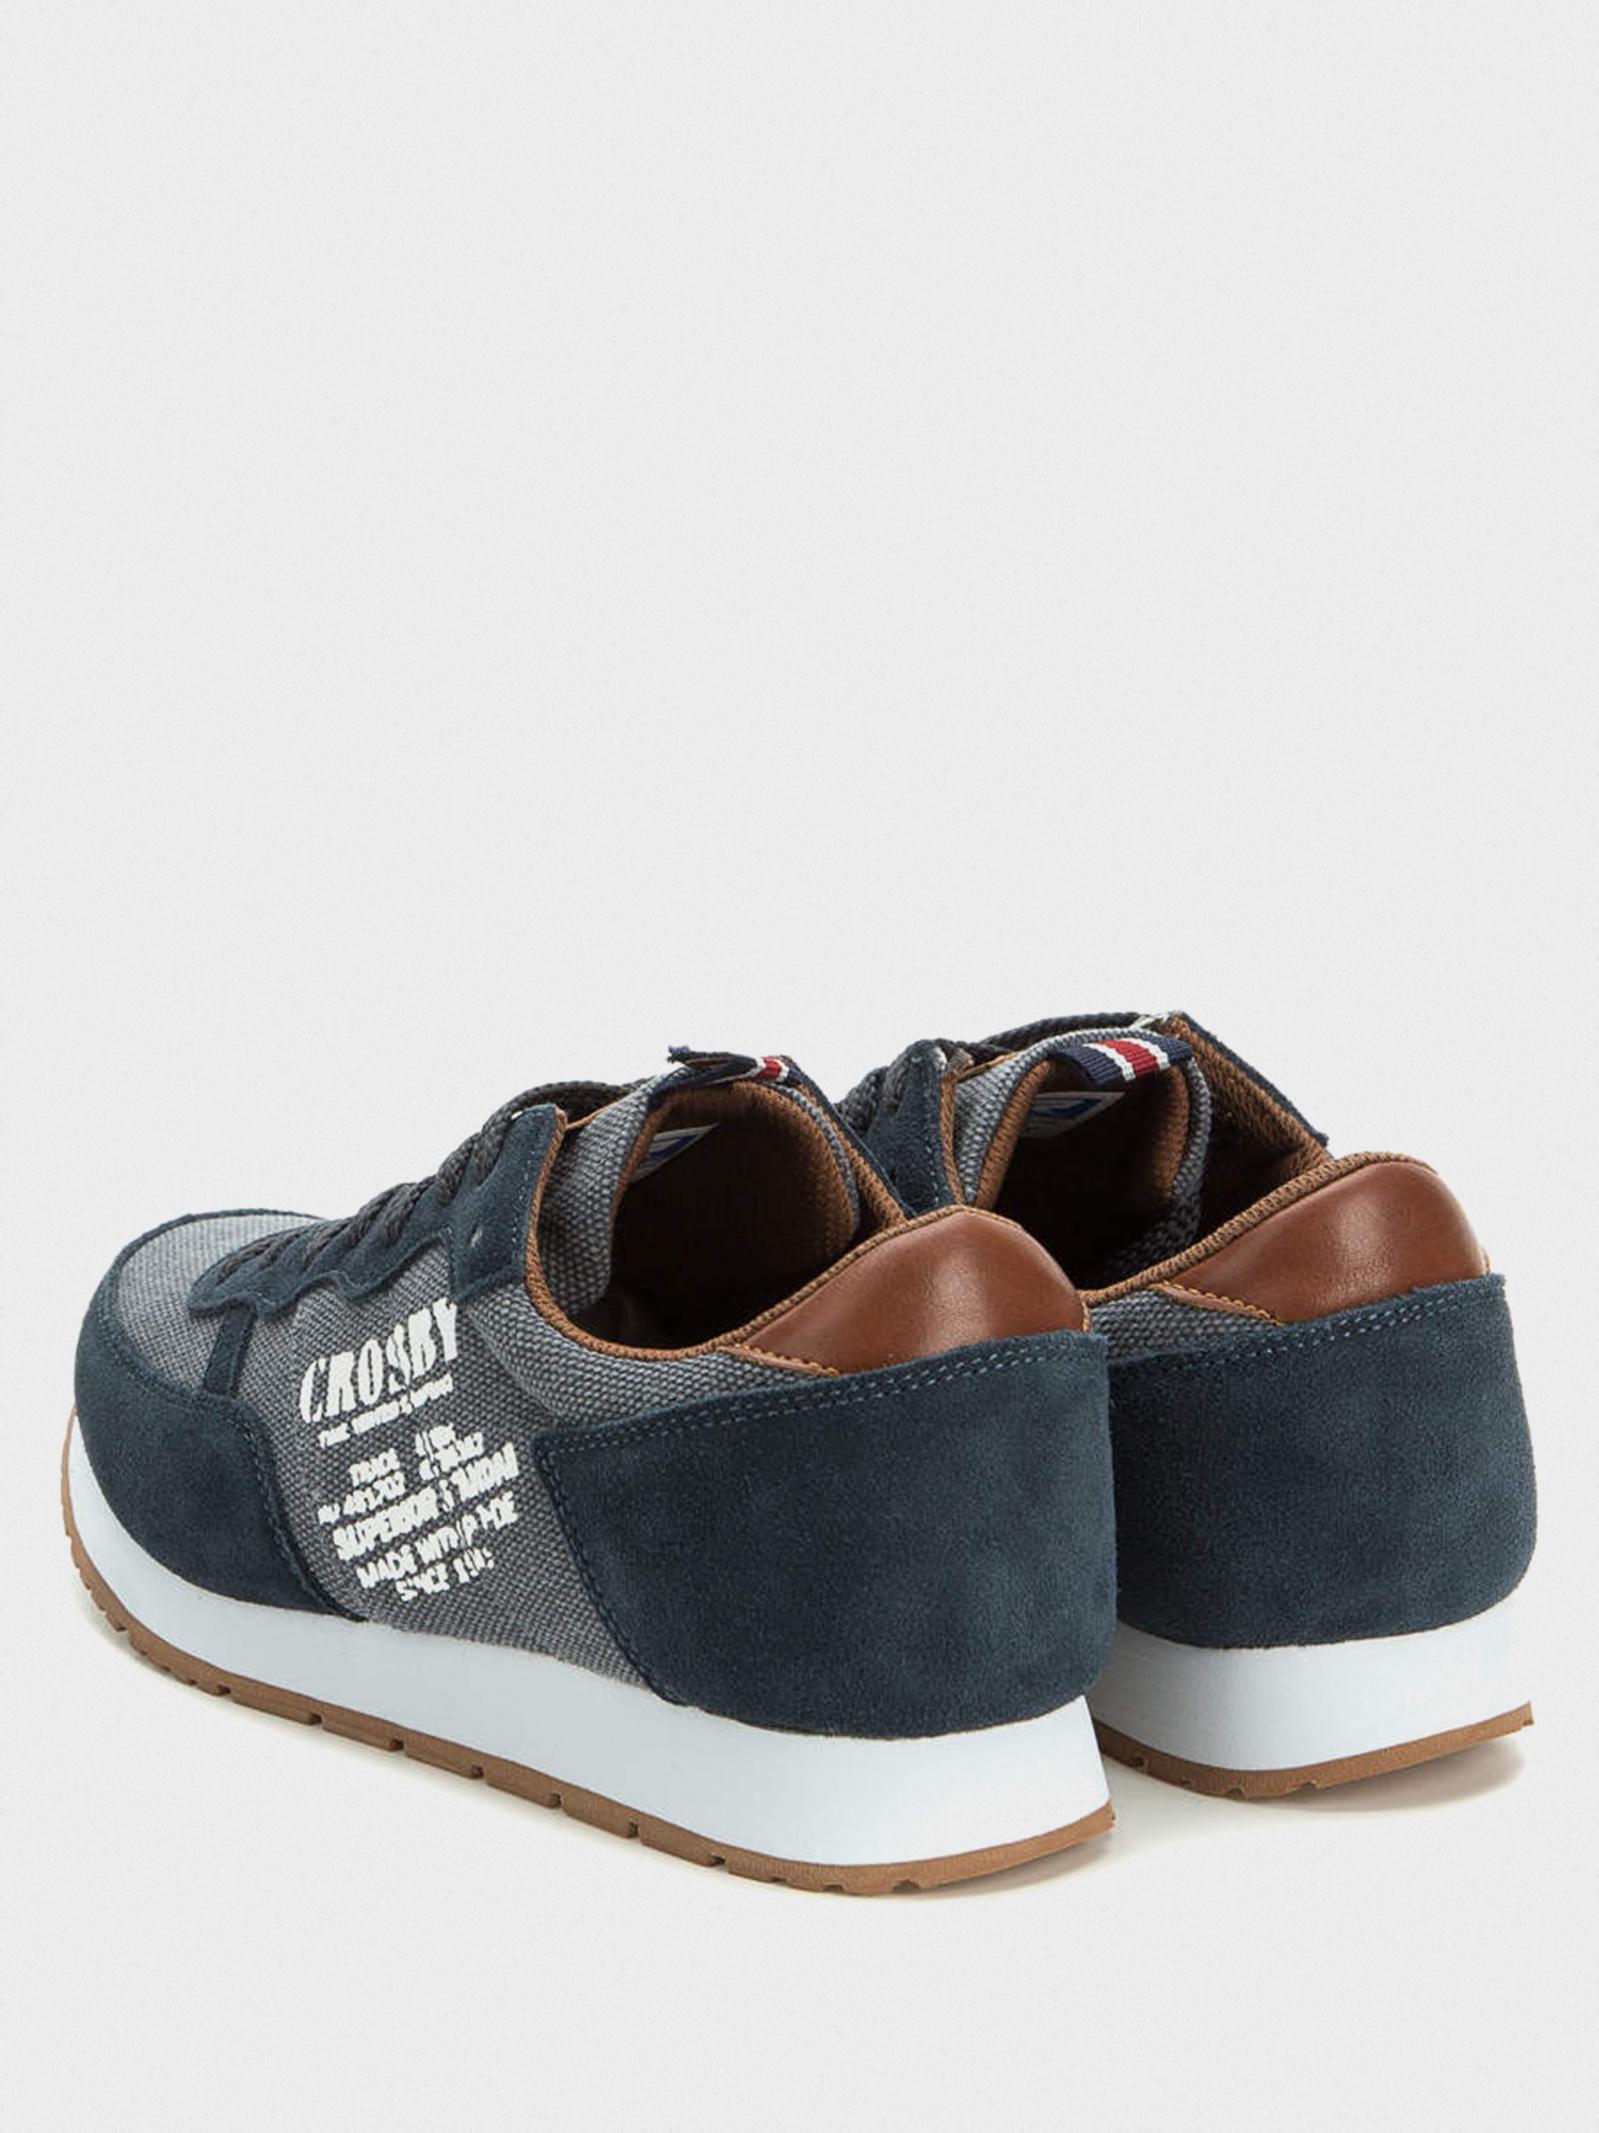 Кроссовки для мужчин Crosby 207260/02-01 размеры обуви, 2017